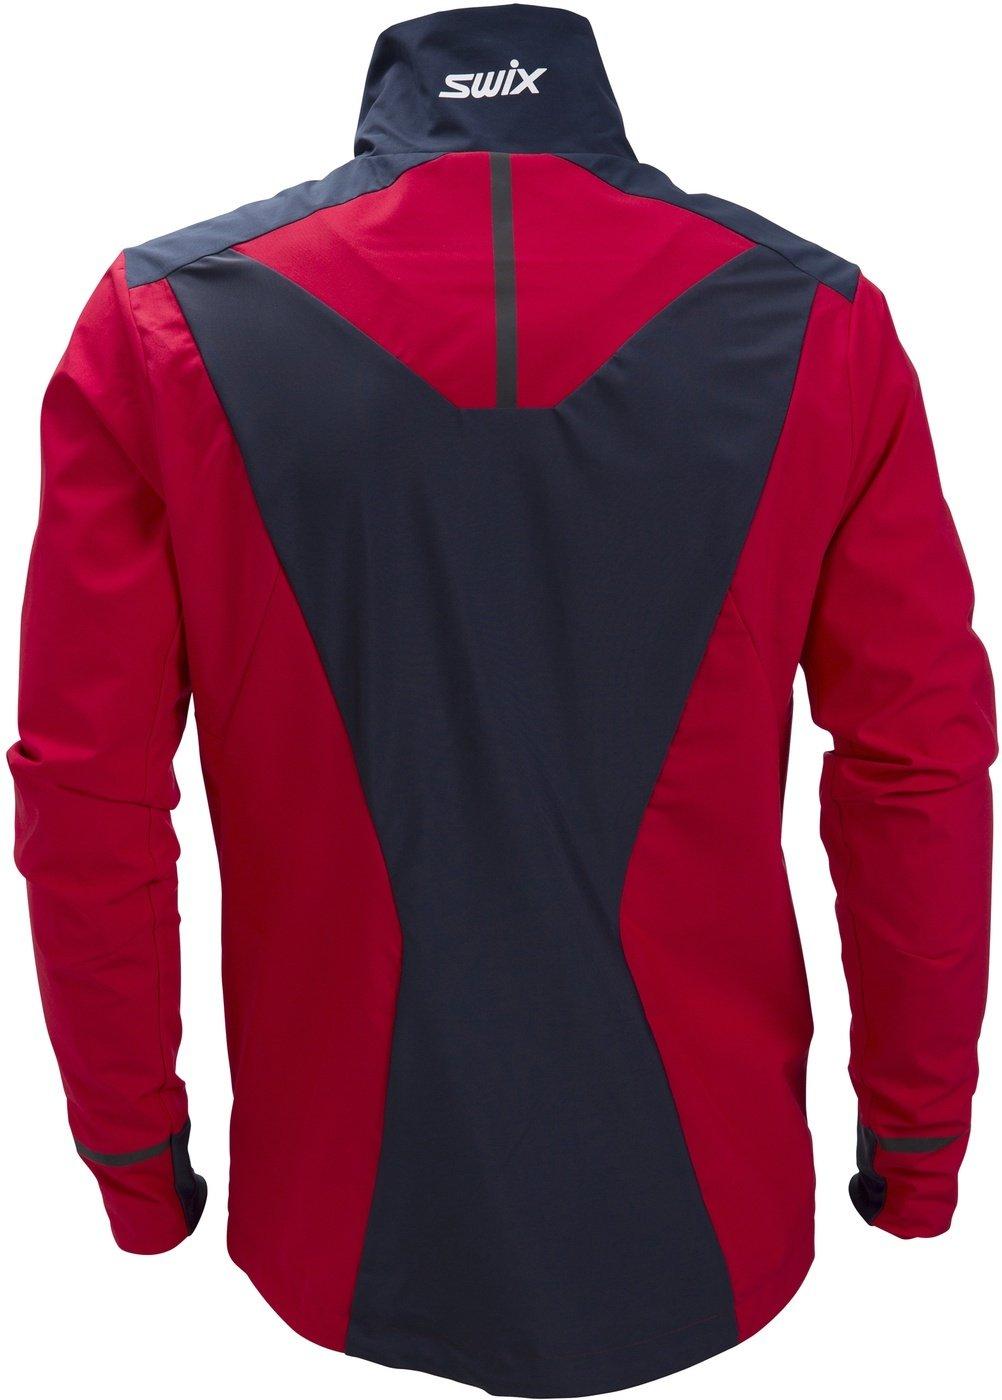 Best pris på Swix Star XC Jacket (Herre) Se priser før